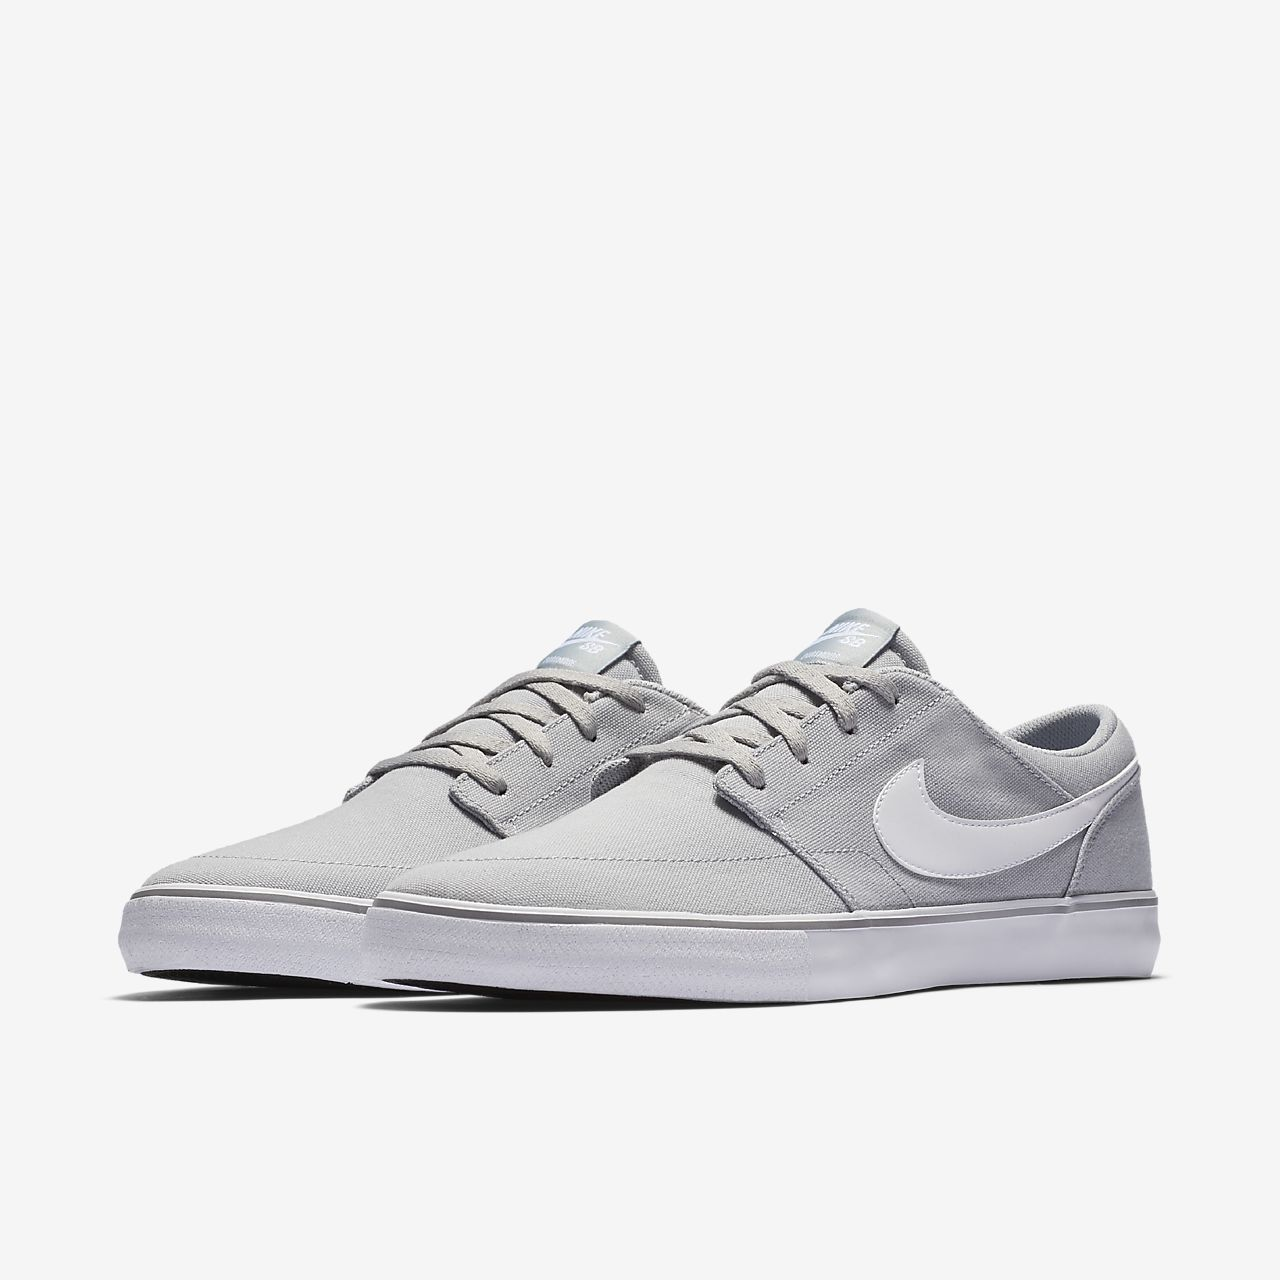 Nike SB PORTMORE II SS CNVS - Trainers - wolf grey/white/black 7B1HI0J3st